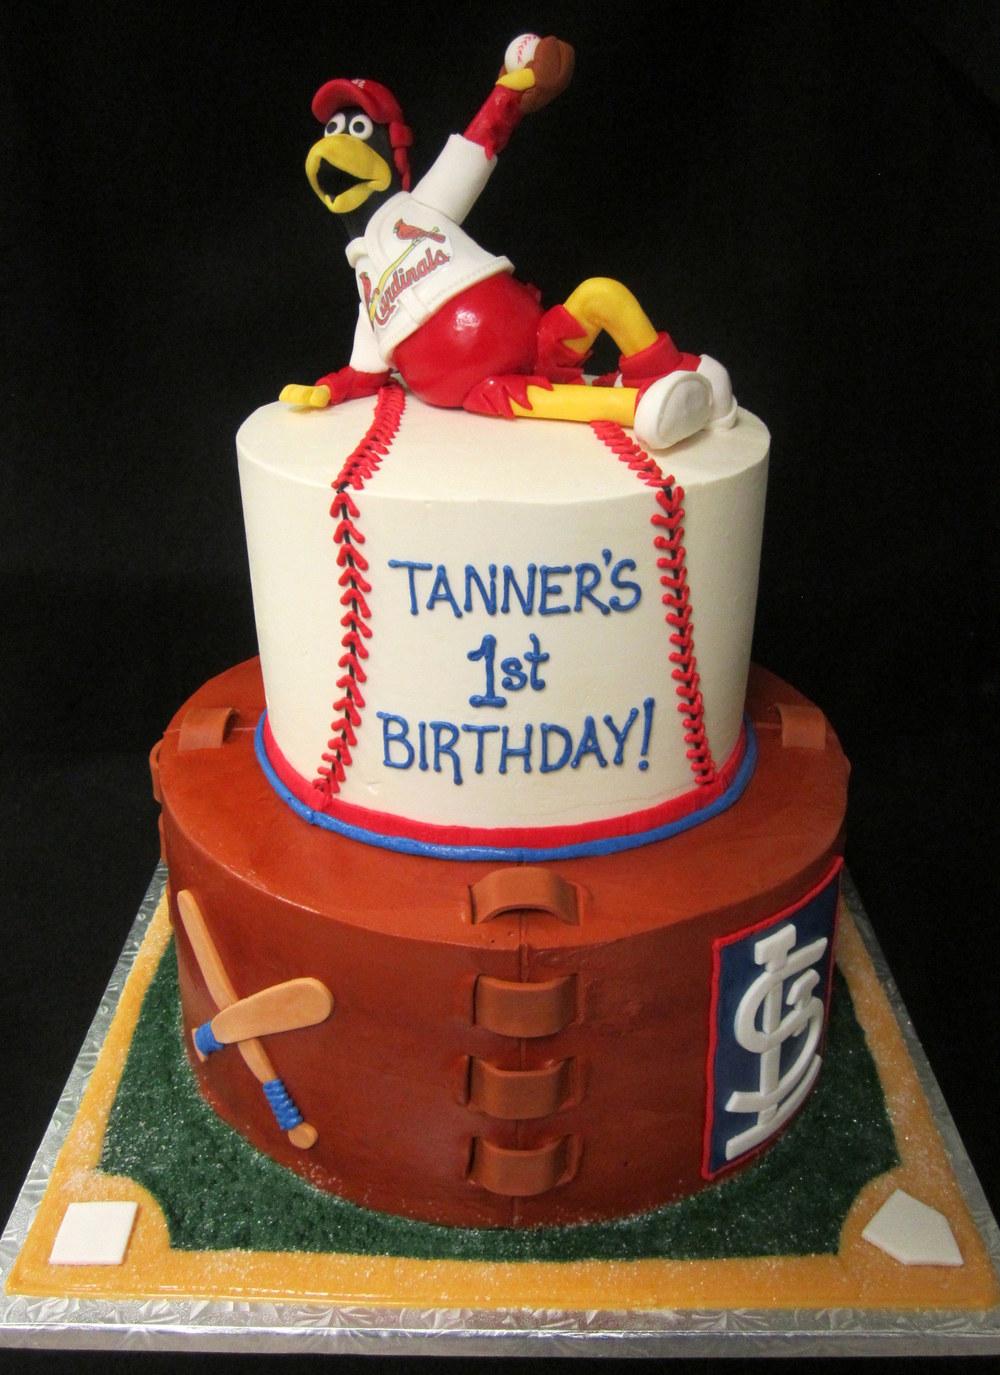 cardinals fredbird baseball cake.jpg